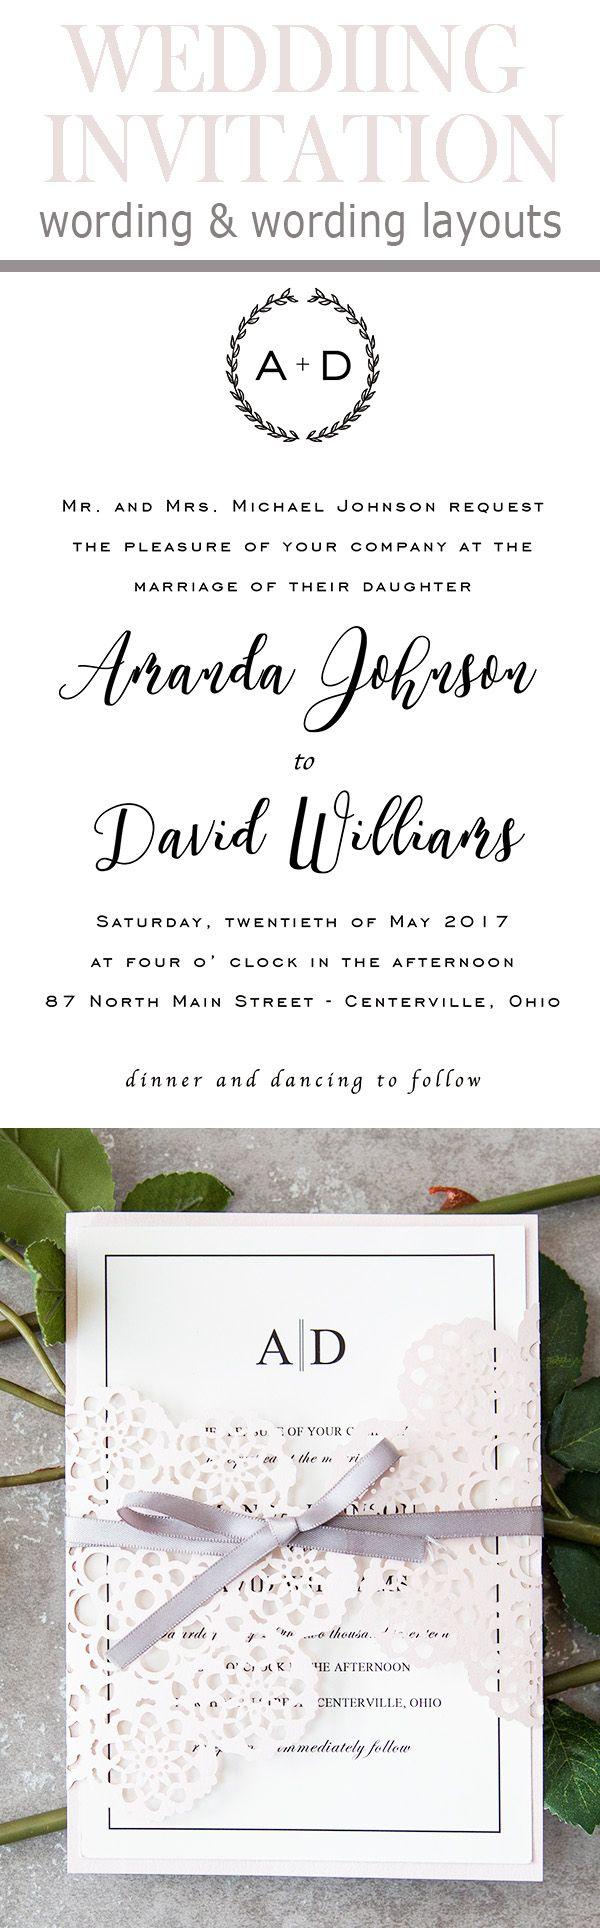 wedding invitations wording quotes%0A popular wedding invitation wording template ideas